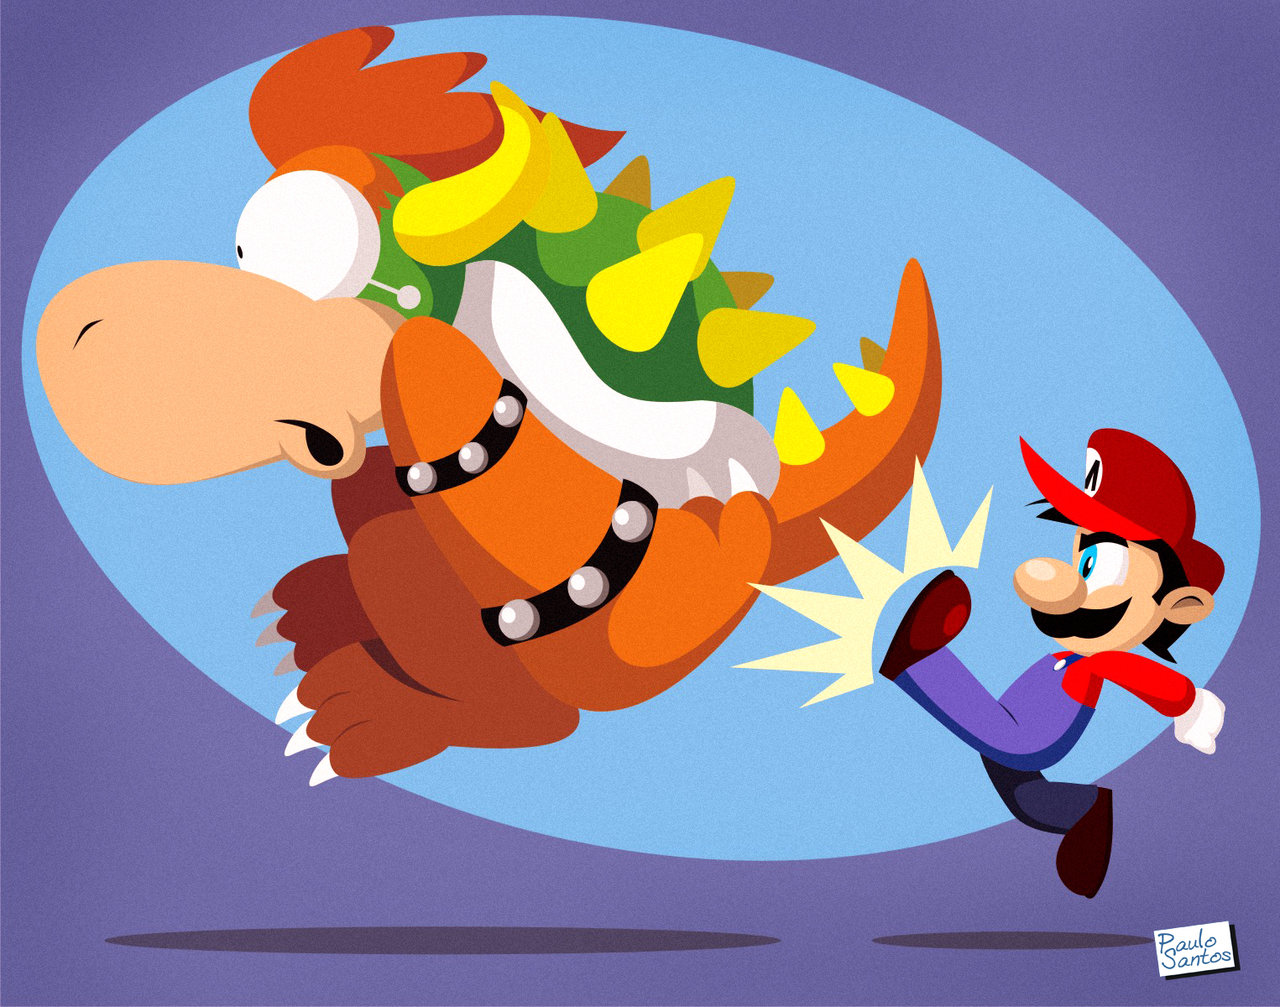 Vem på Nintendo får sparken?